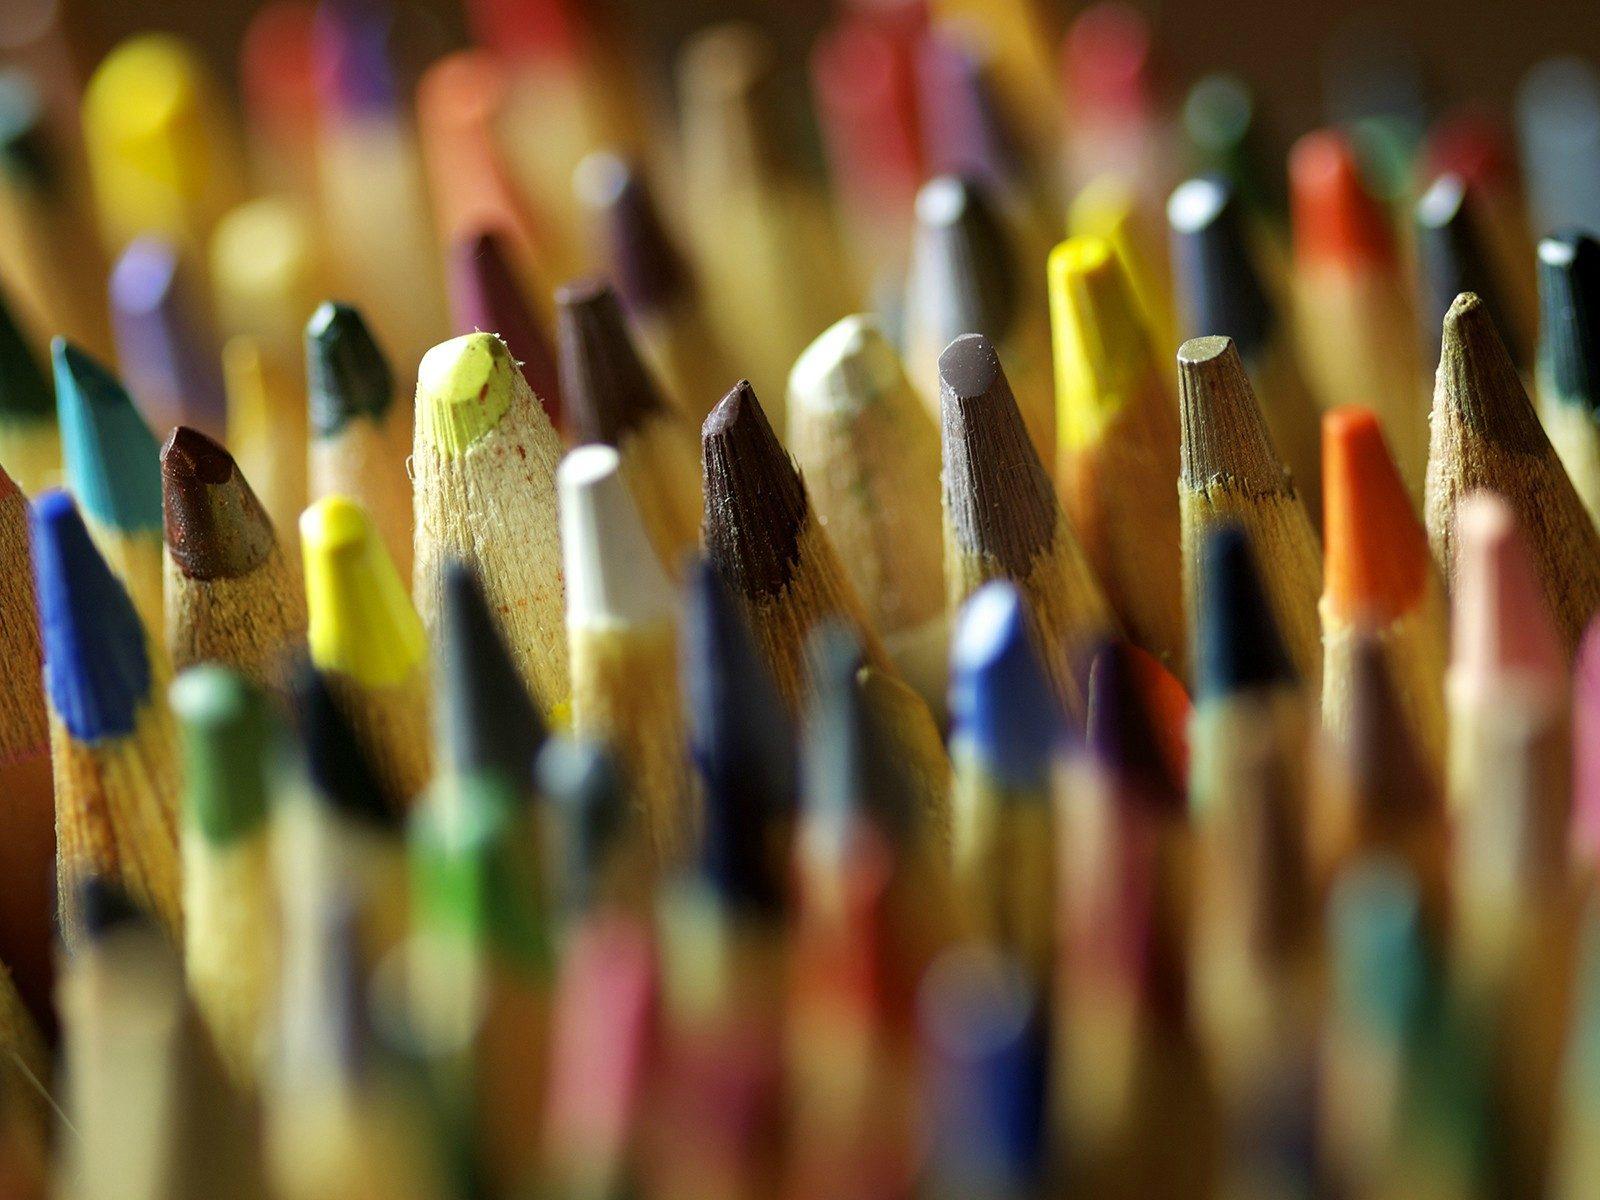 Cars Wallpapers 480x800 Color Pencils Close Up Wallpaper Hd Wallpaper Background